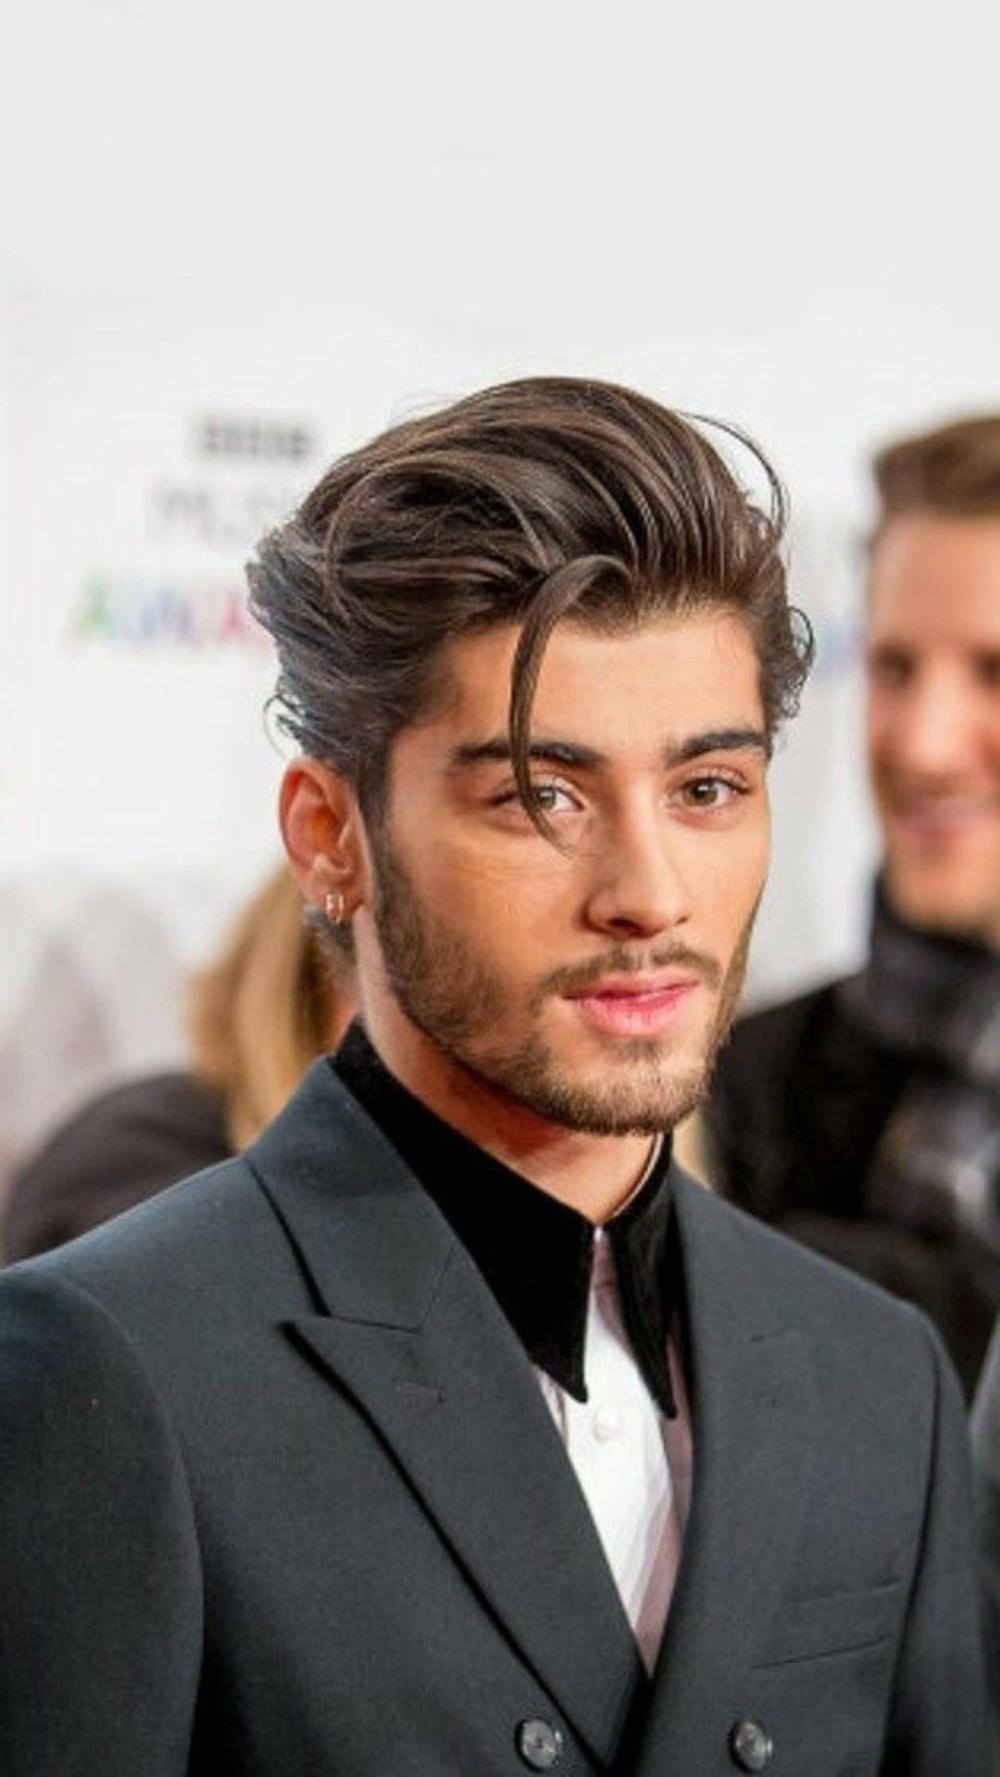 zayn malik hairstyles long - Google Search in 12  Top haircuts